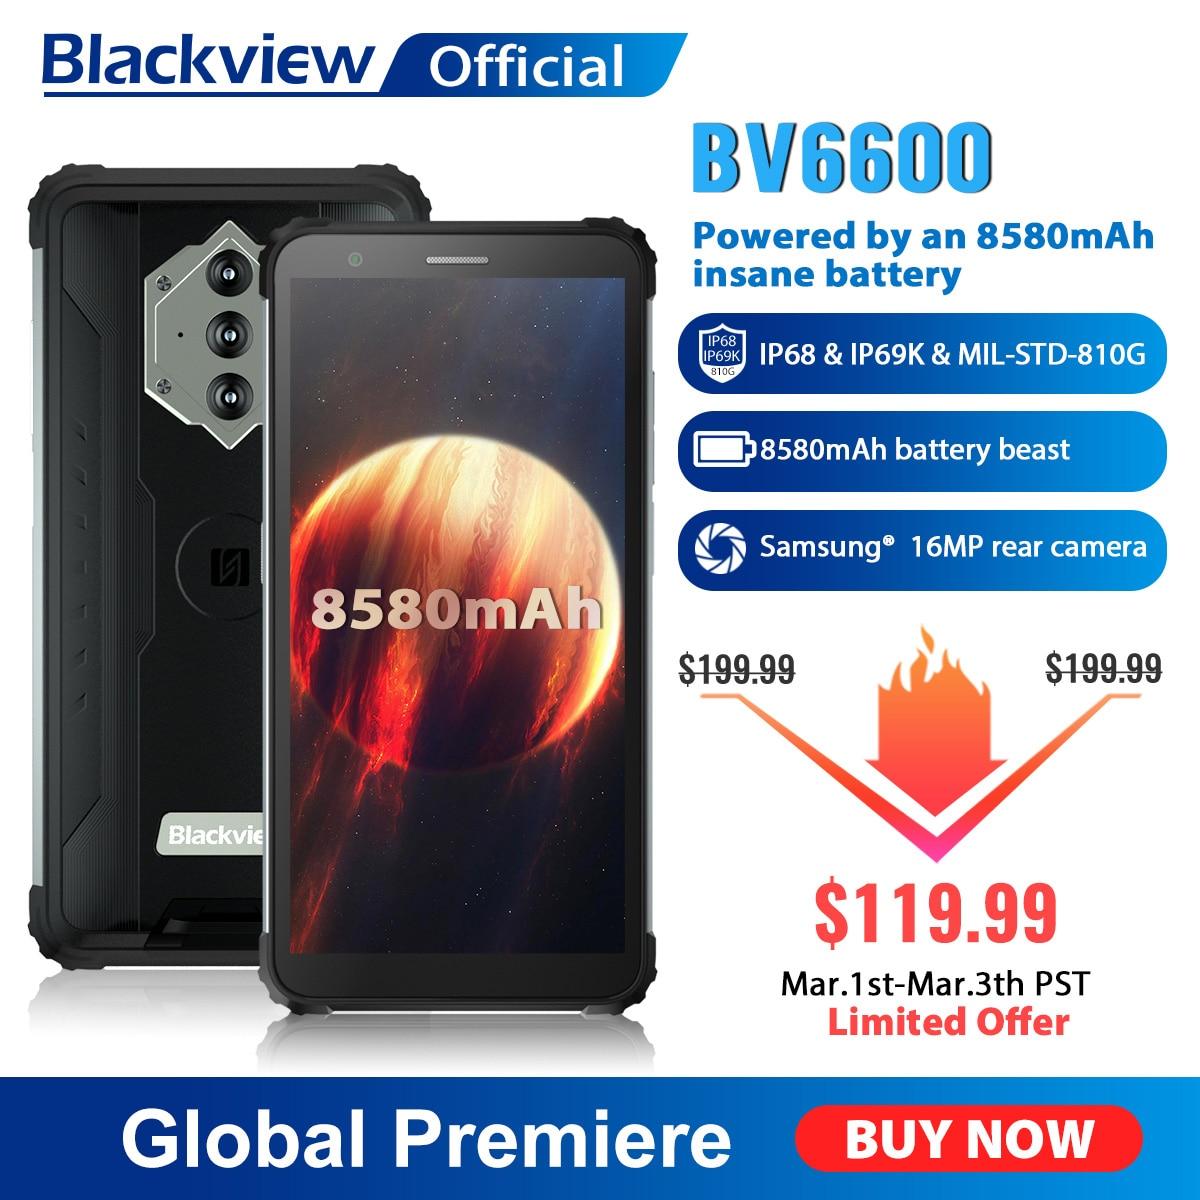 Blackview BV6600 IP68 Водонепроницаемый 8580 мА/ч, прочный смартфон, четыре ядра, 4 Гб + 64 Гб 5,7